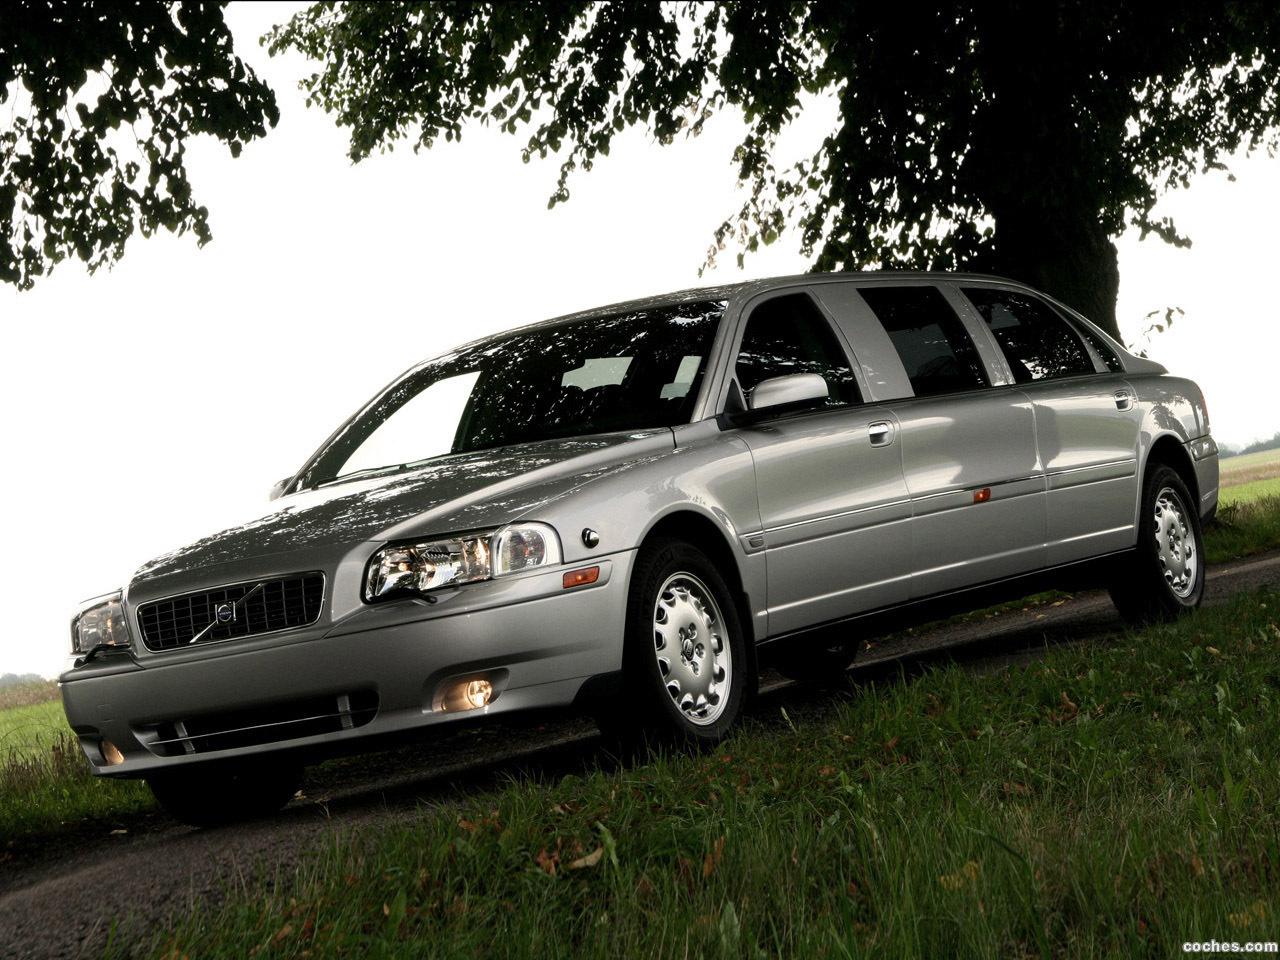 volvo_s80-limousine-by-nilsson_r4